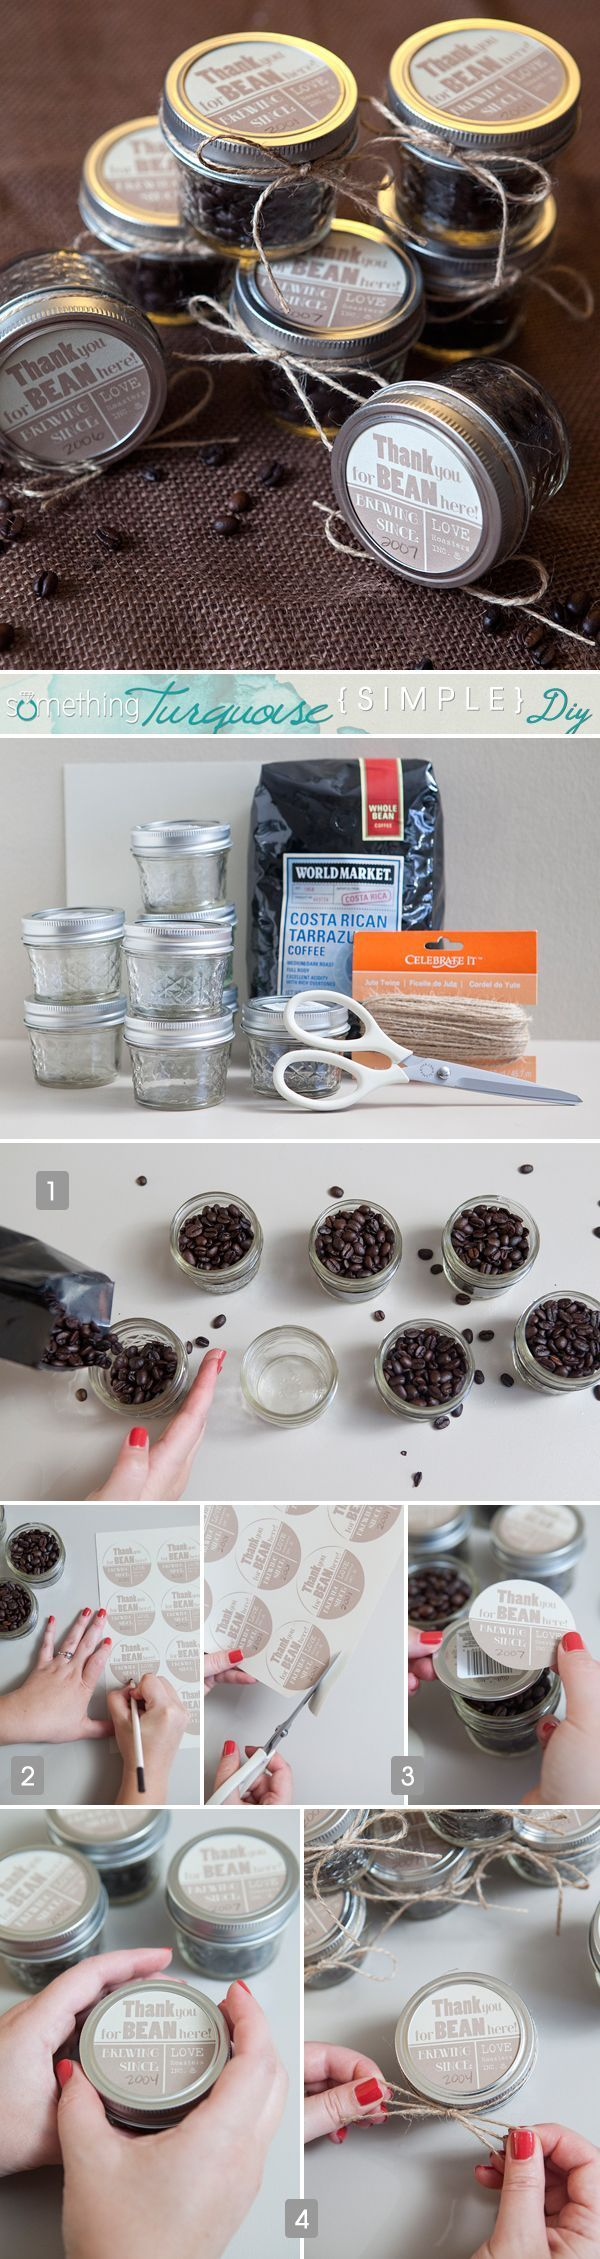 Coffee Bean Wedding Favors in Mason Jars.